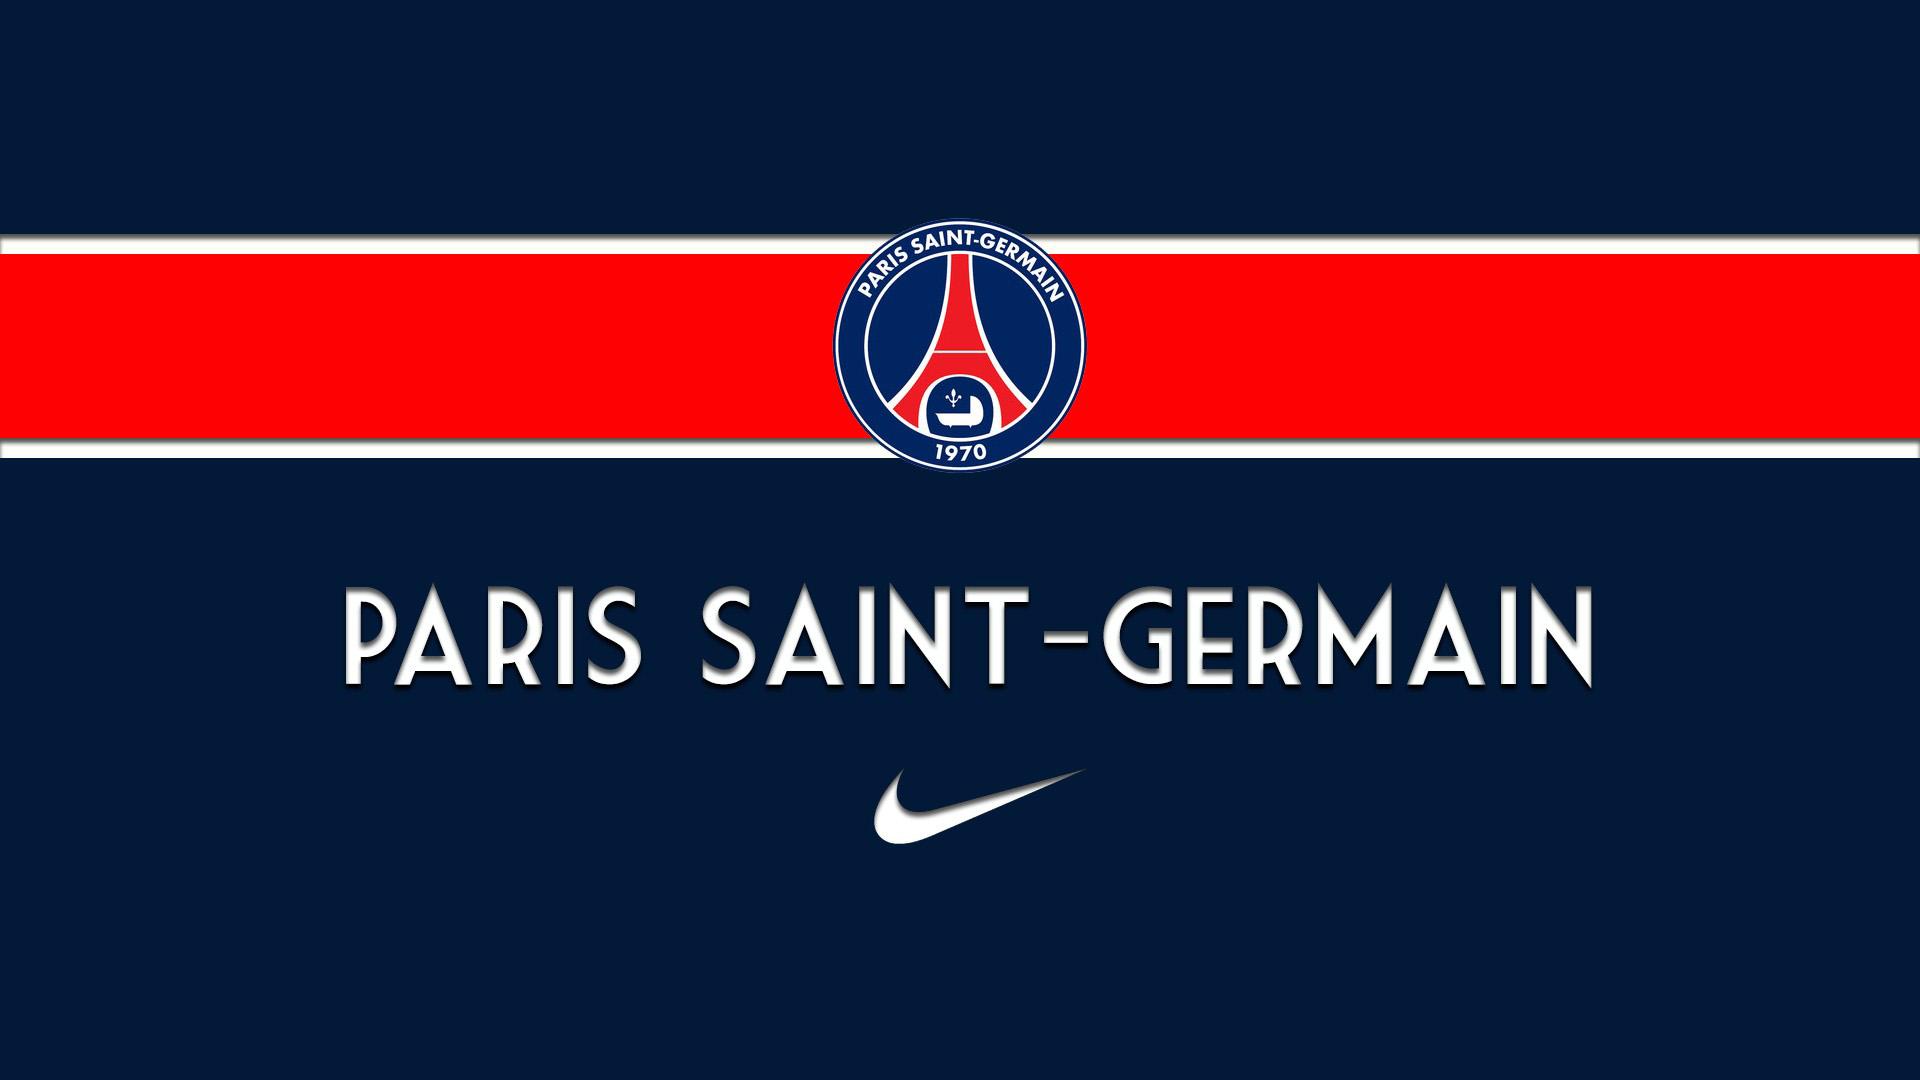 PSG Paris Saint Germain wallpaper 1920x1080